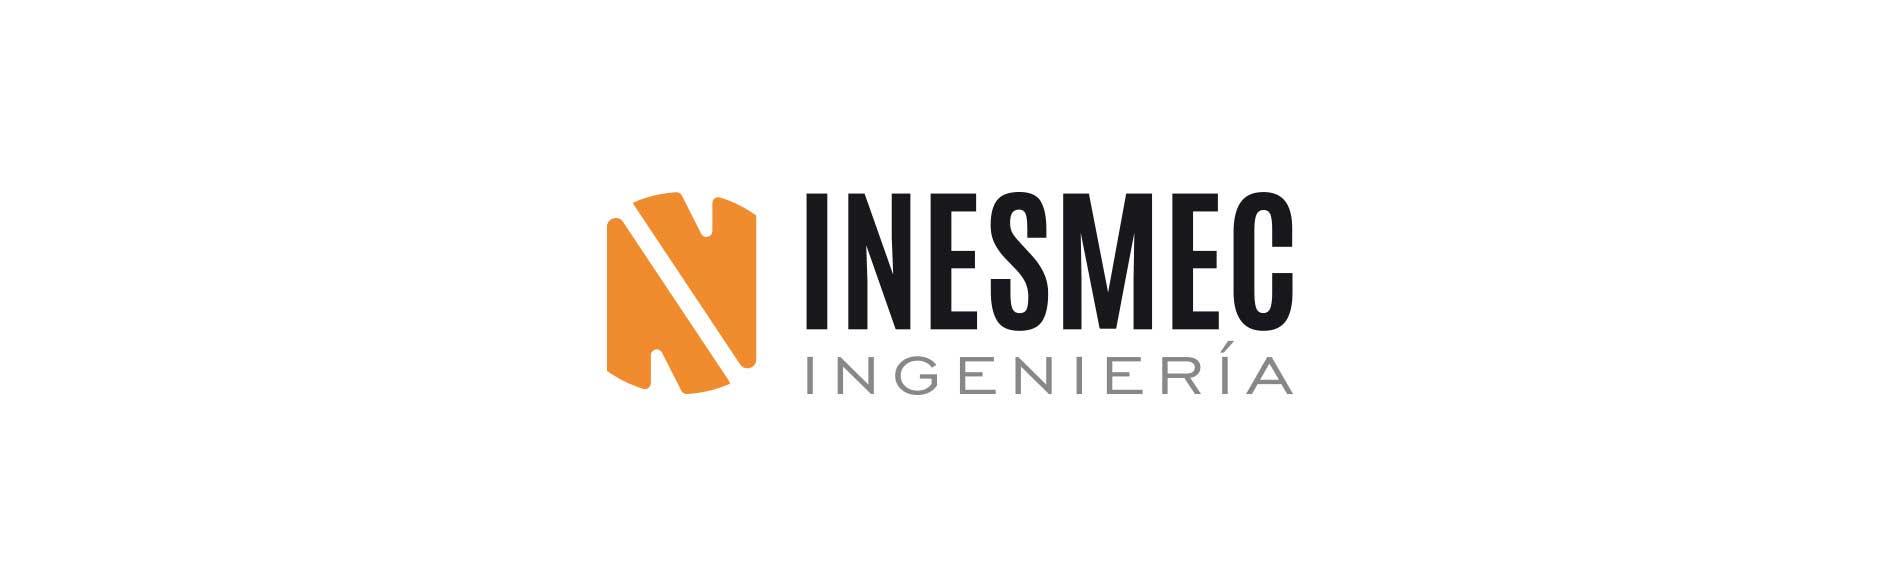 inesmec_brand